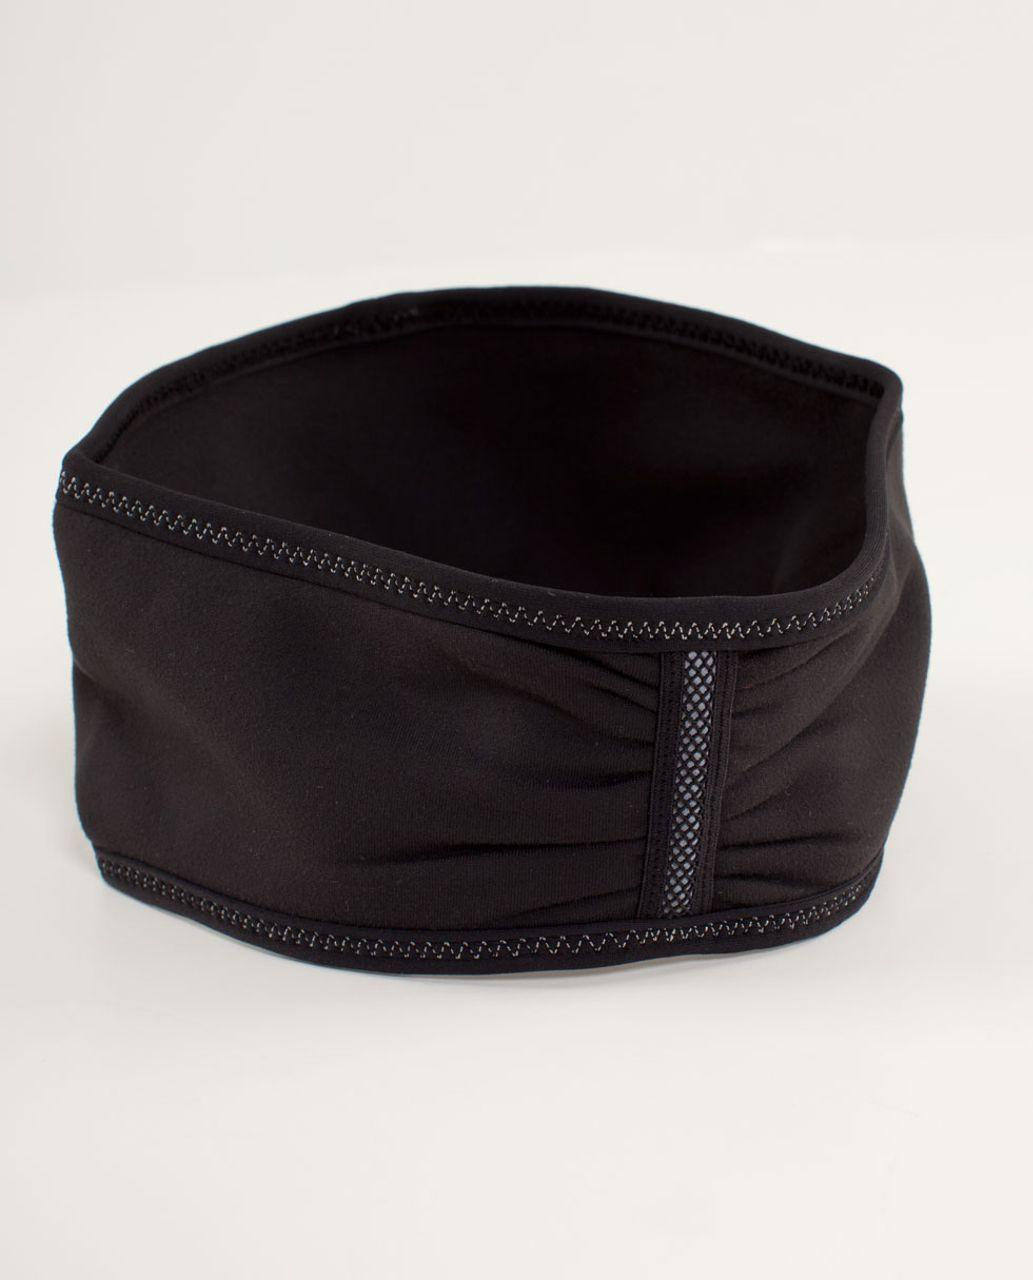 Lululemon Brisk Run Headband - Black / Black